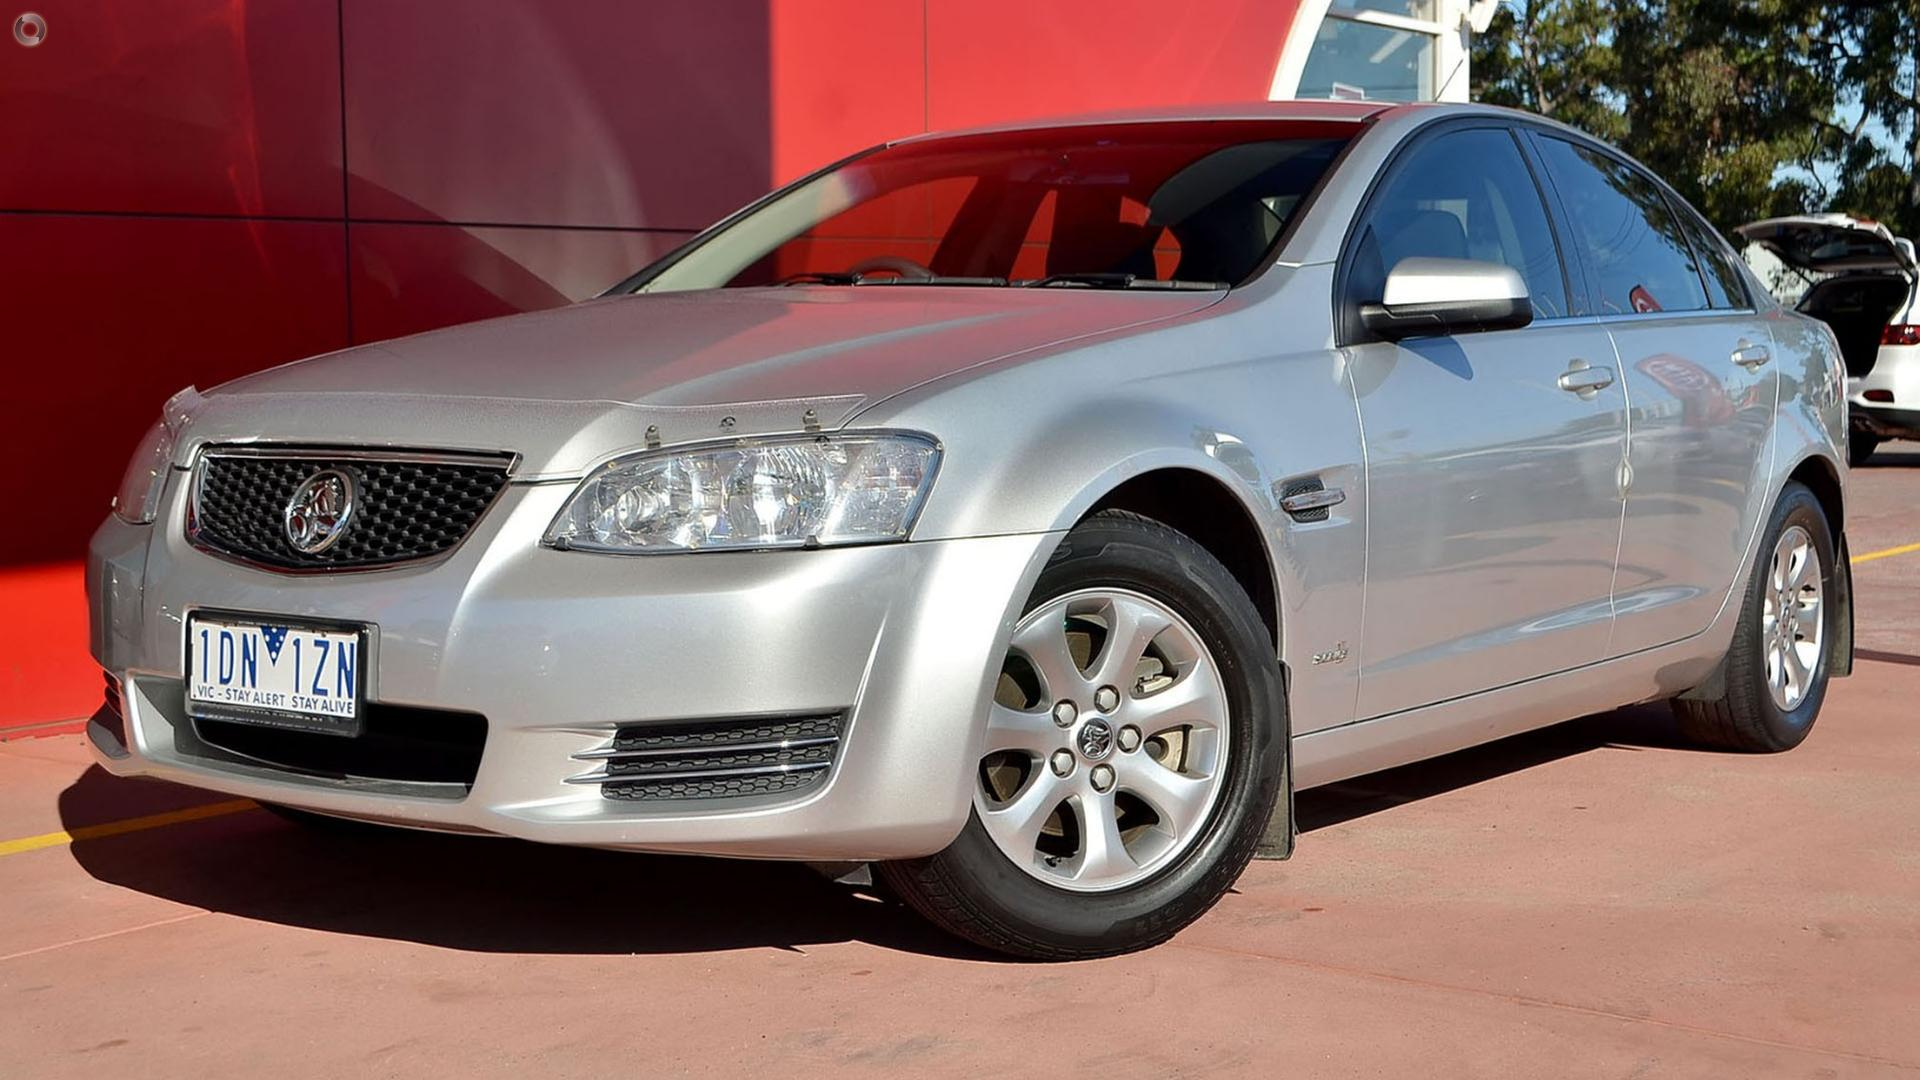 2012 Holden Commodore VE Series II